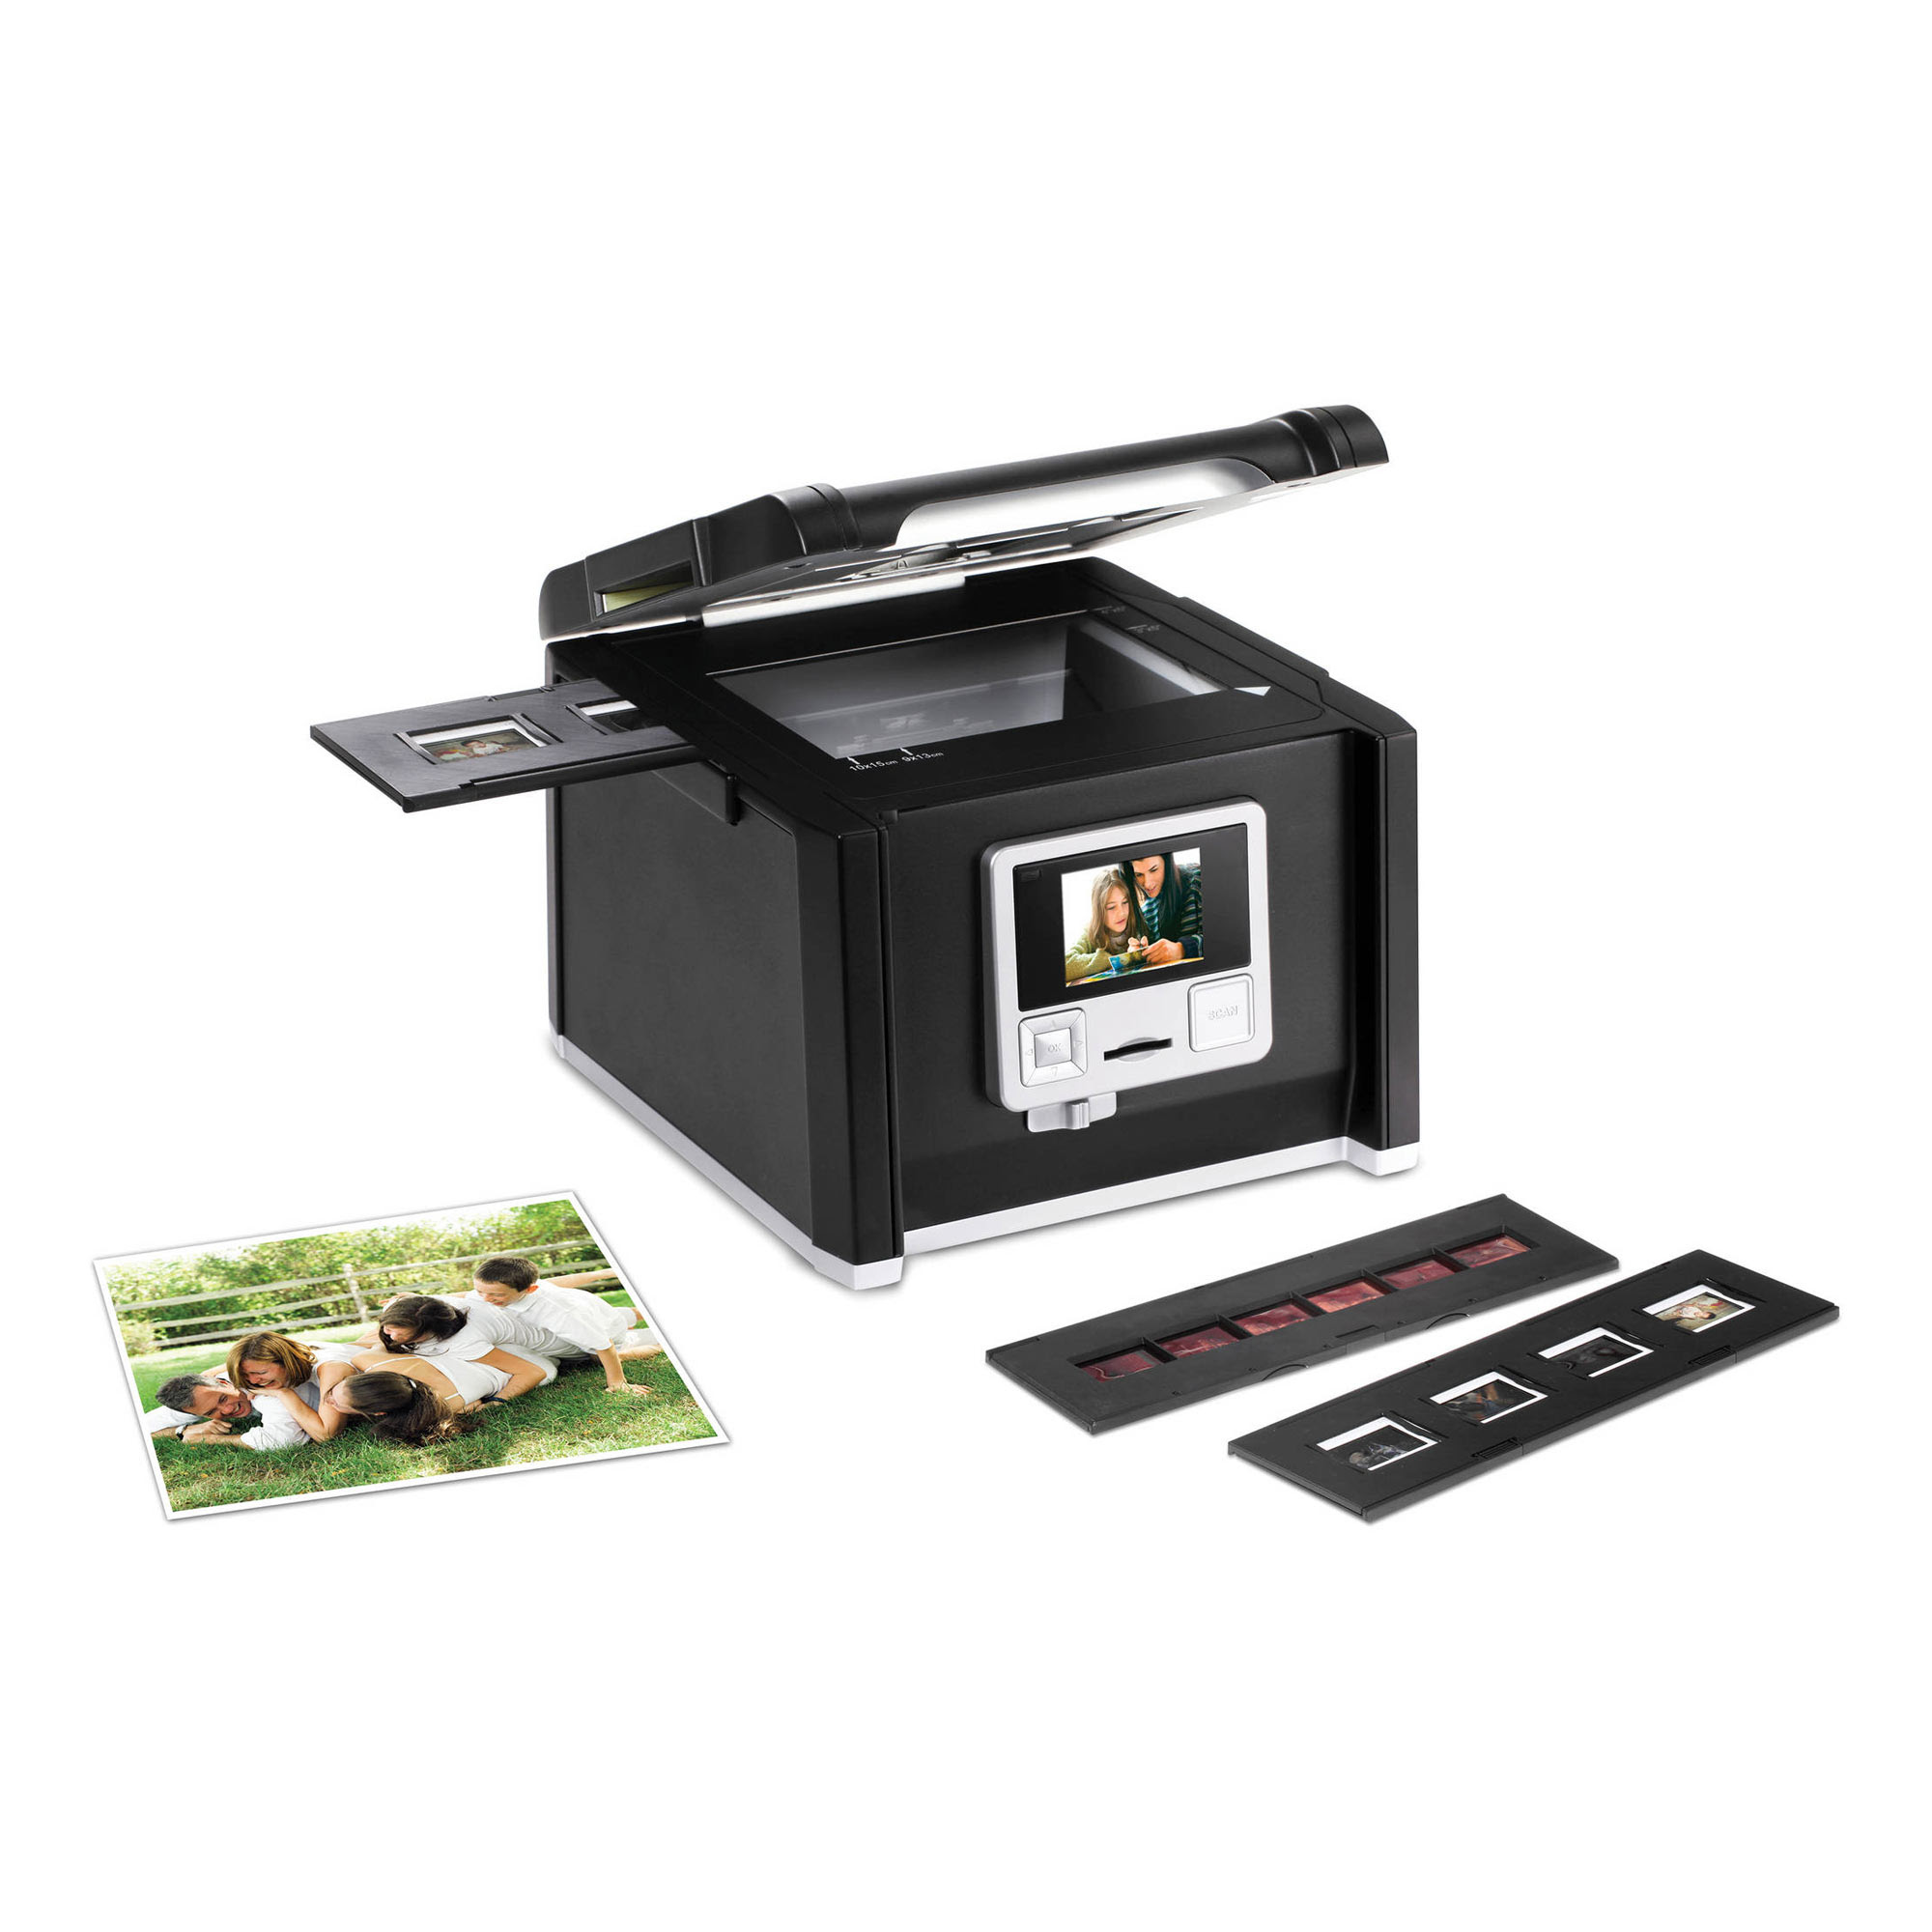 Pacific Image Imagebox Mf 4 In 1 Slide Film Photo Converter Mf